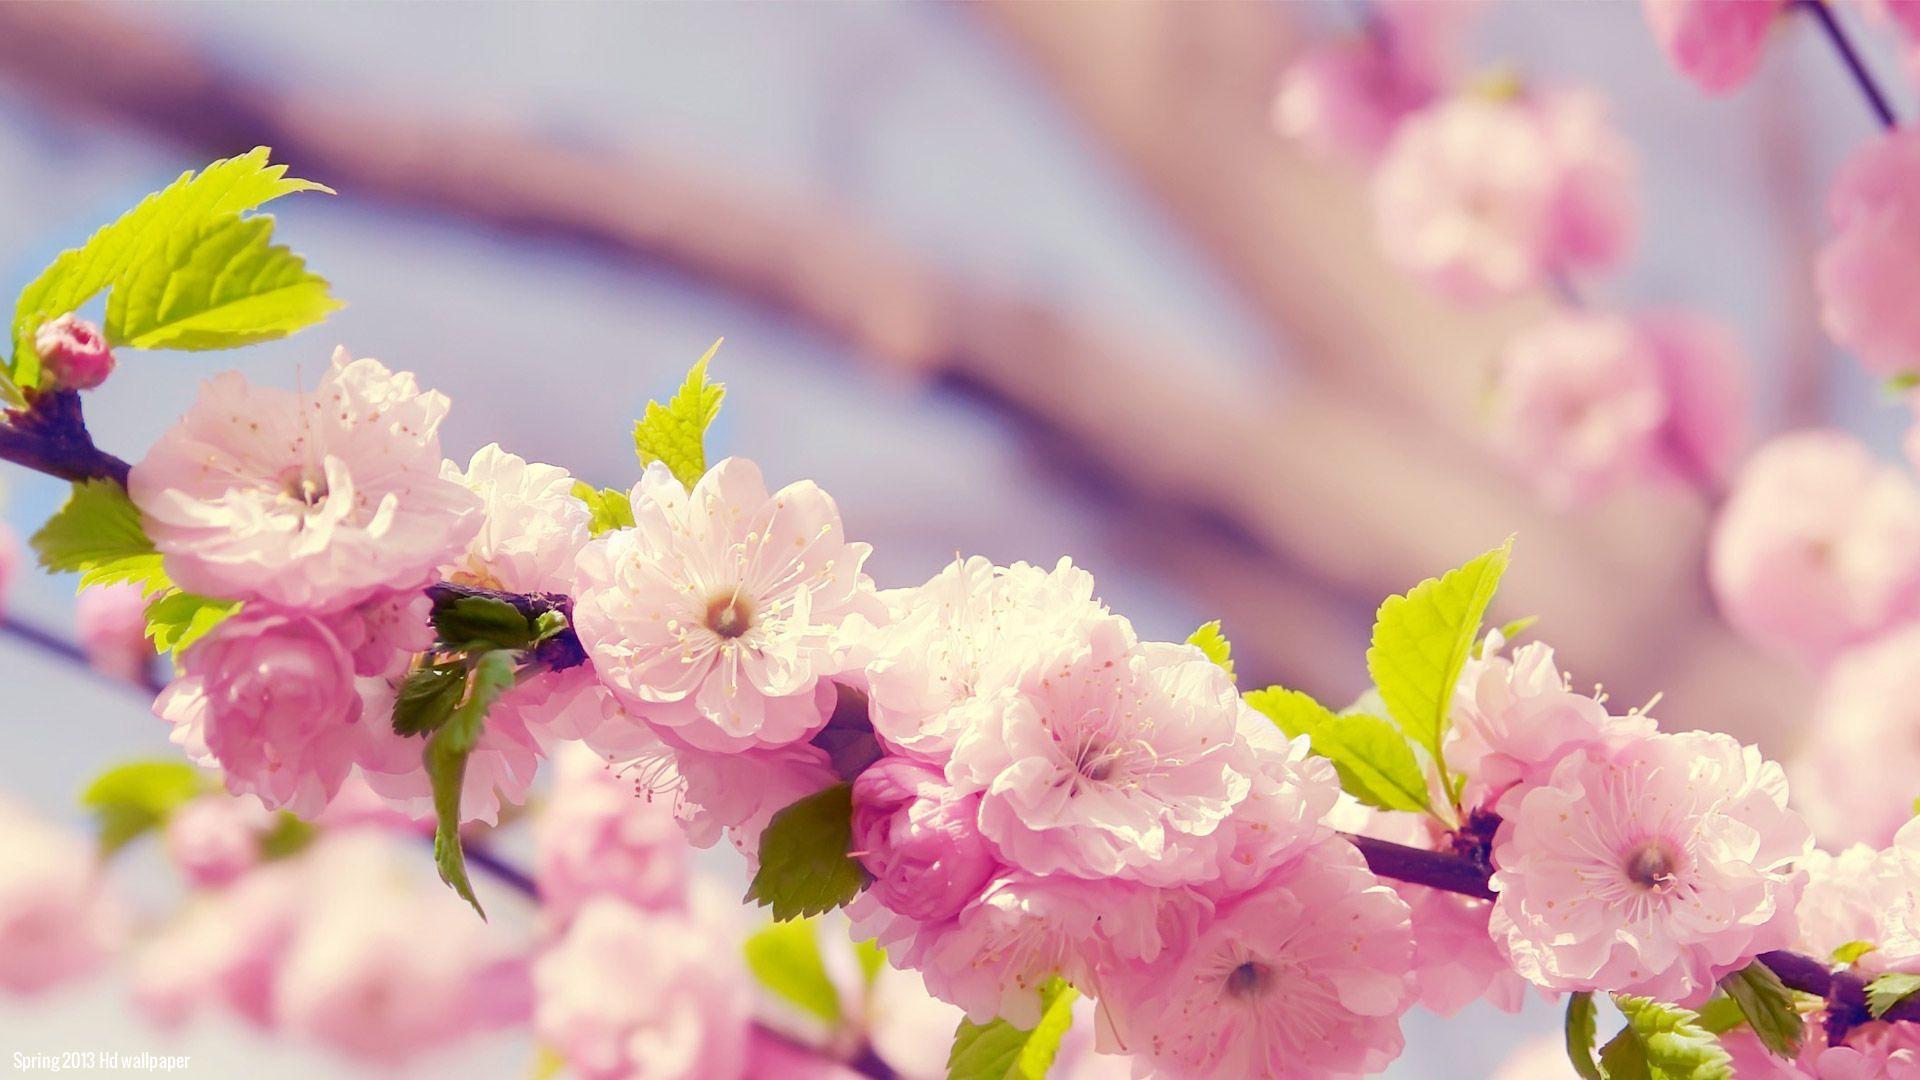 Spring Flowers Wallpaper Wide at Landscape Monodomo 1920x1080